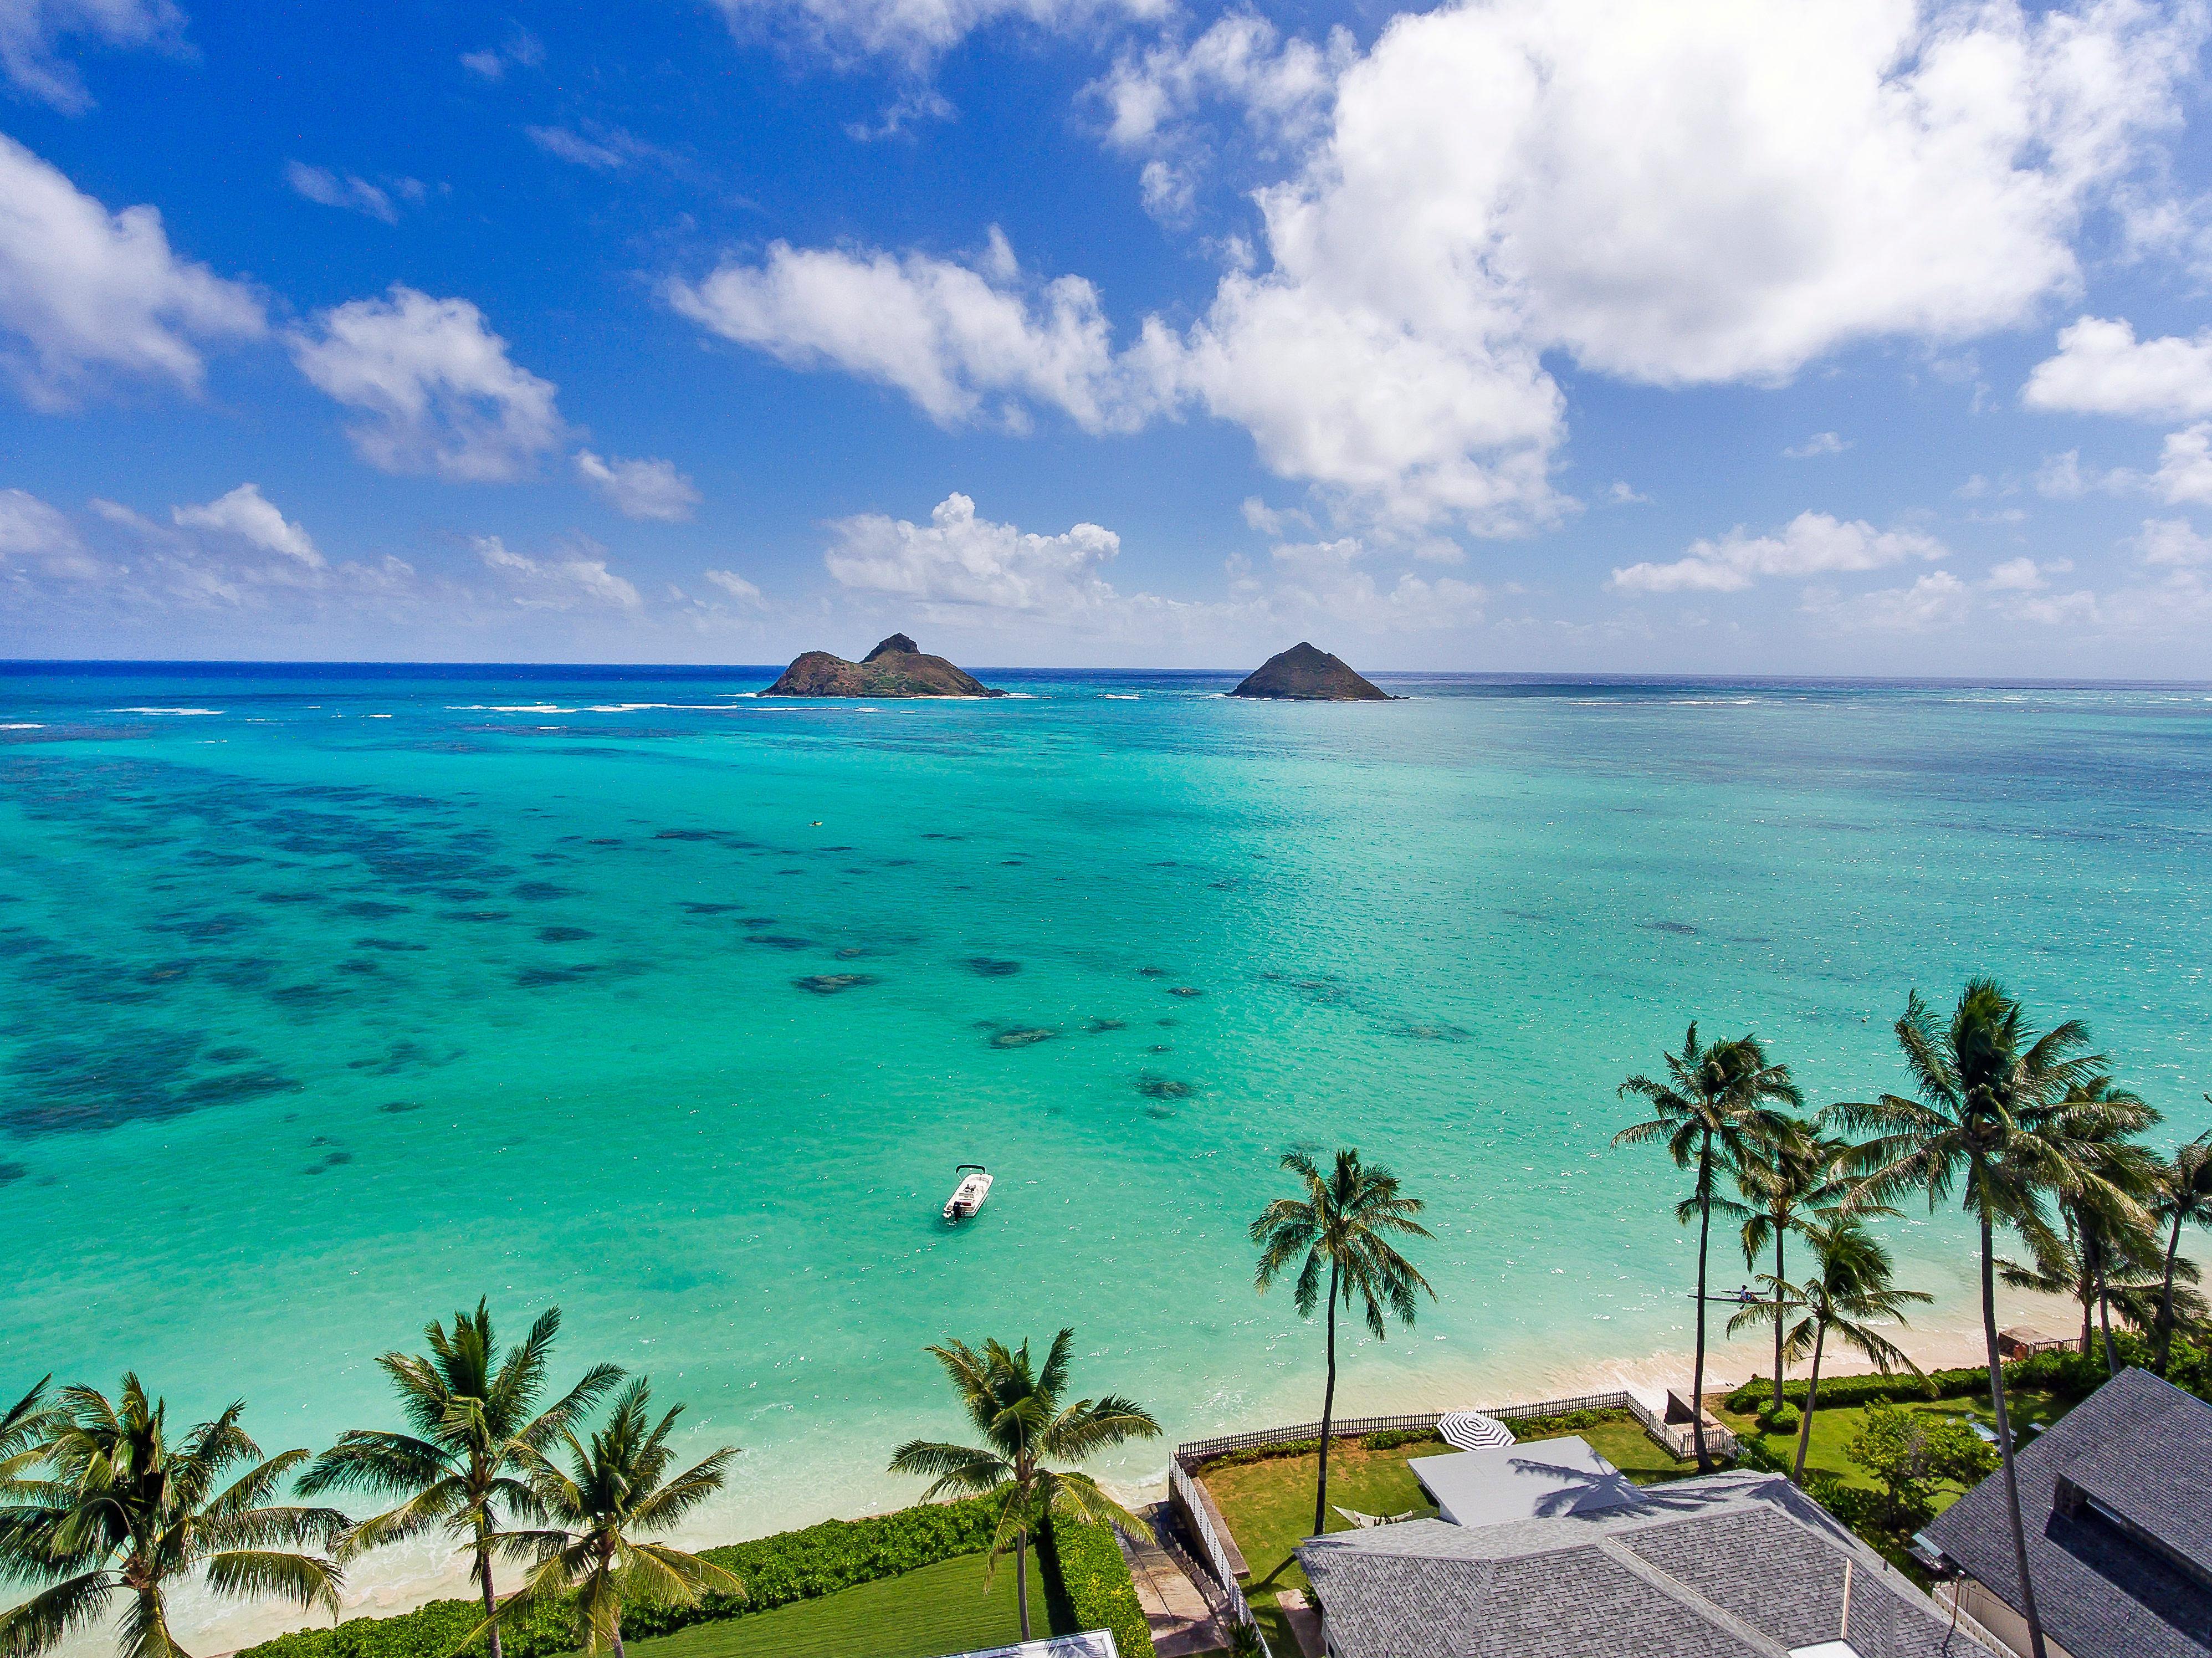 Beach Side Hotels Oahu Hawaii